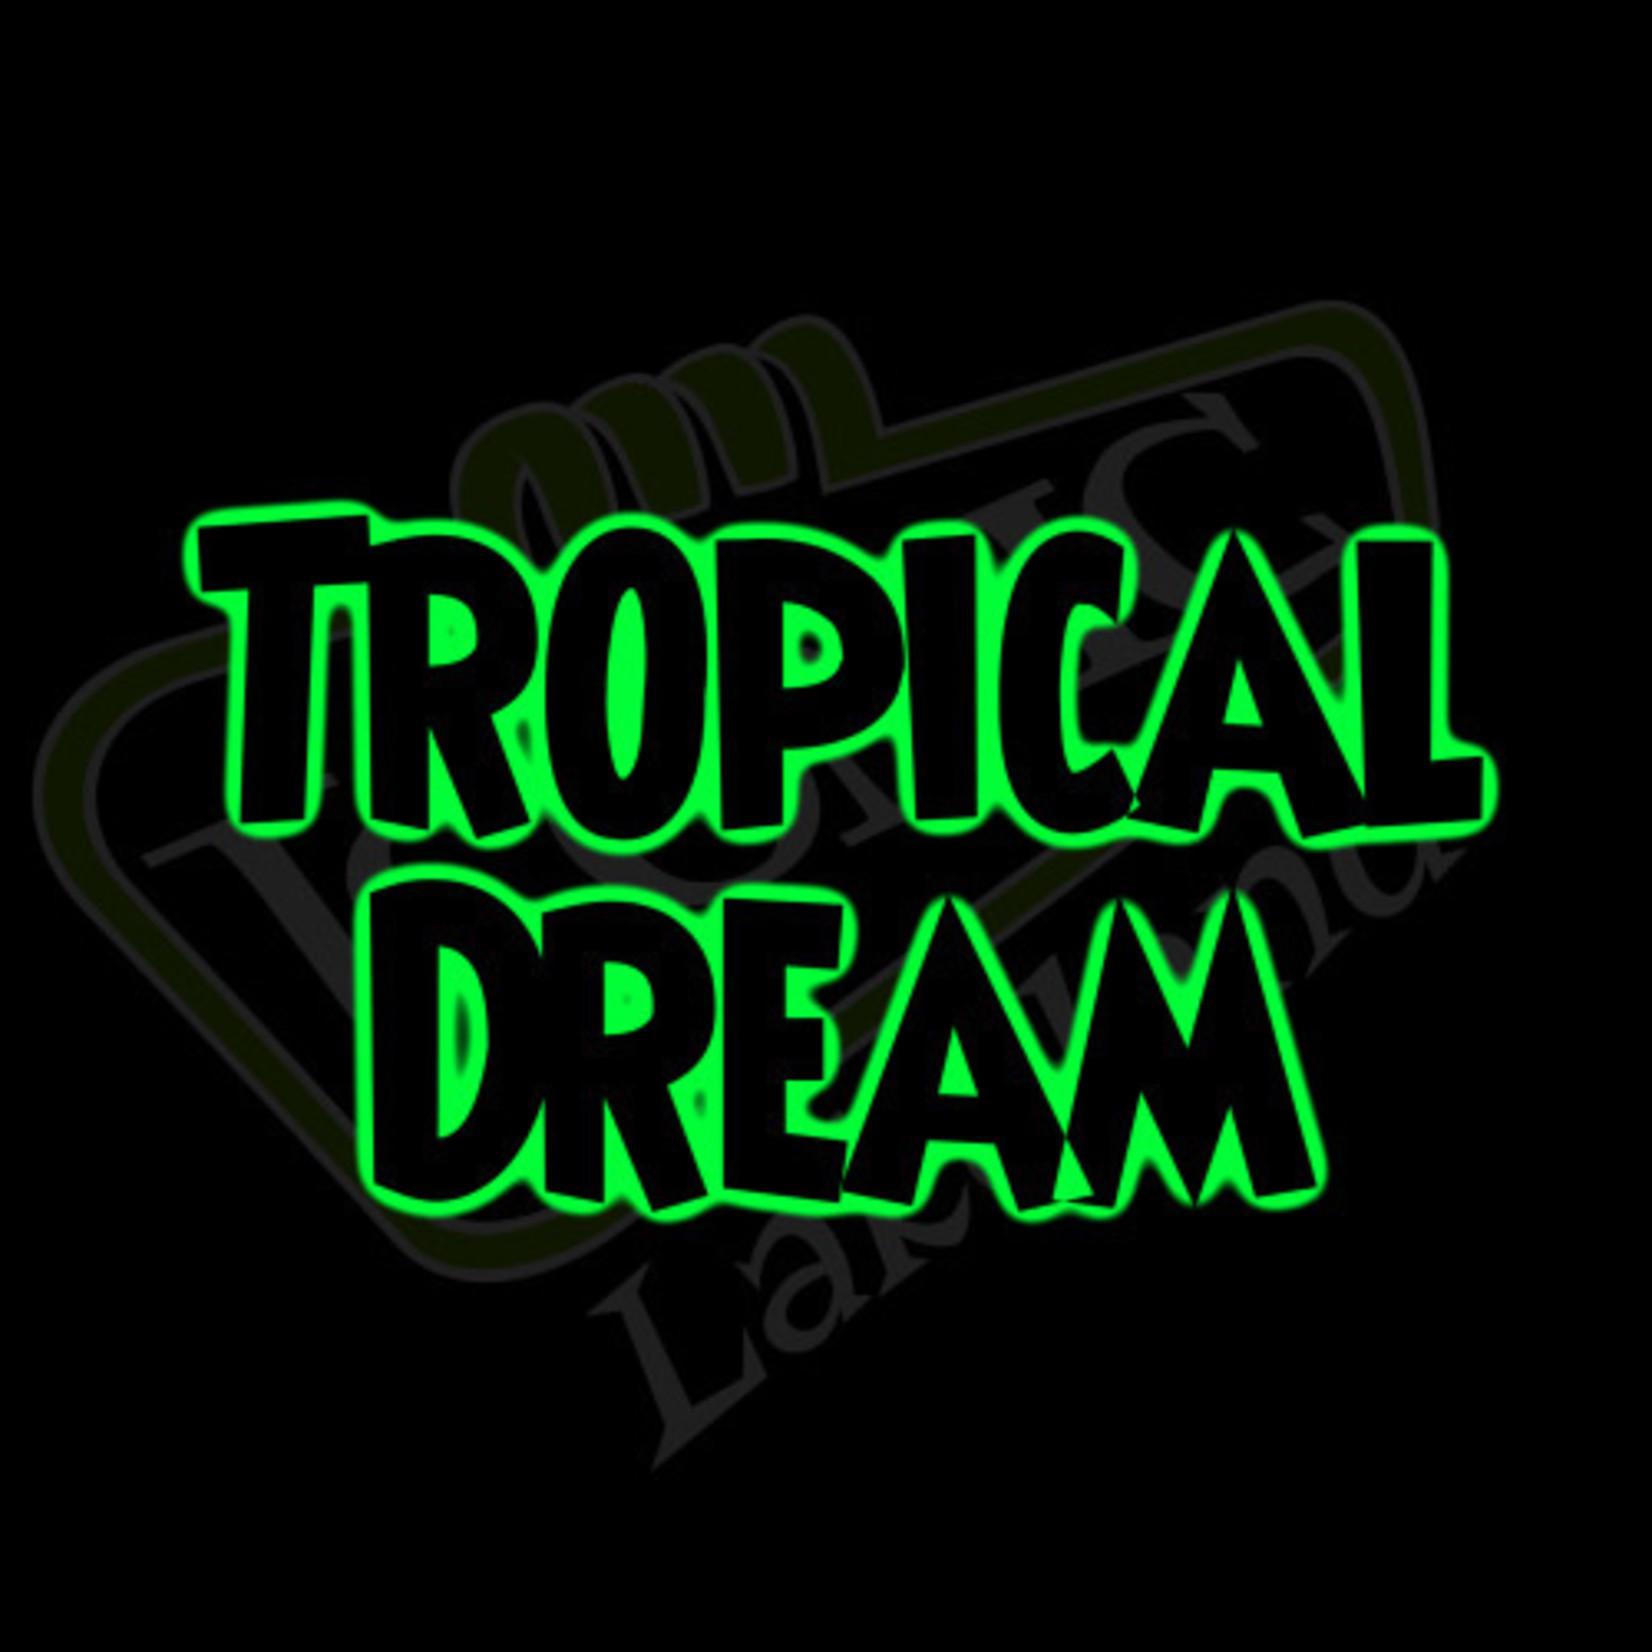 Earth's Bounty Tropical Dream